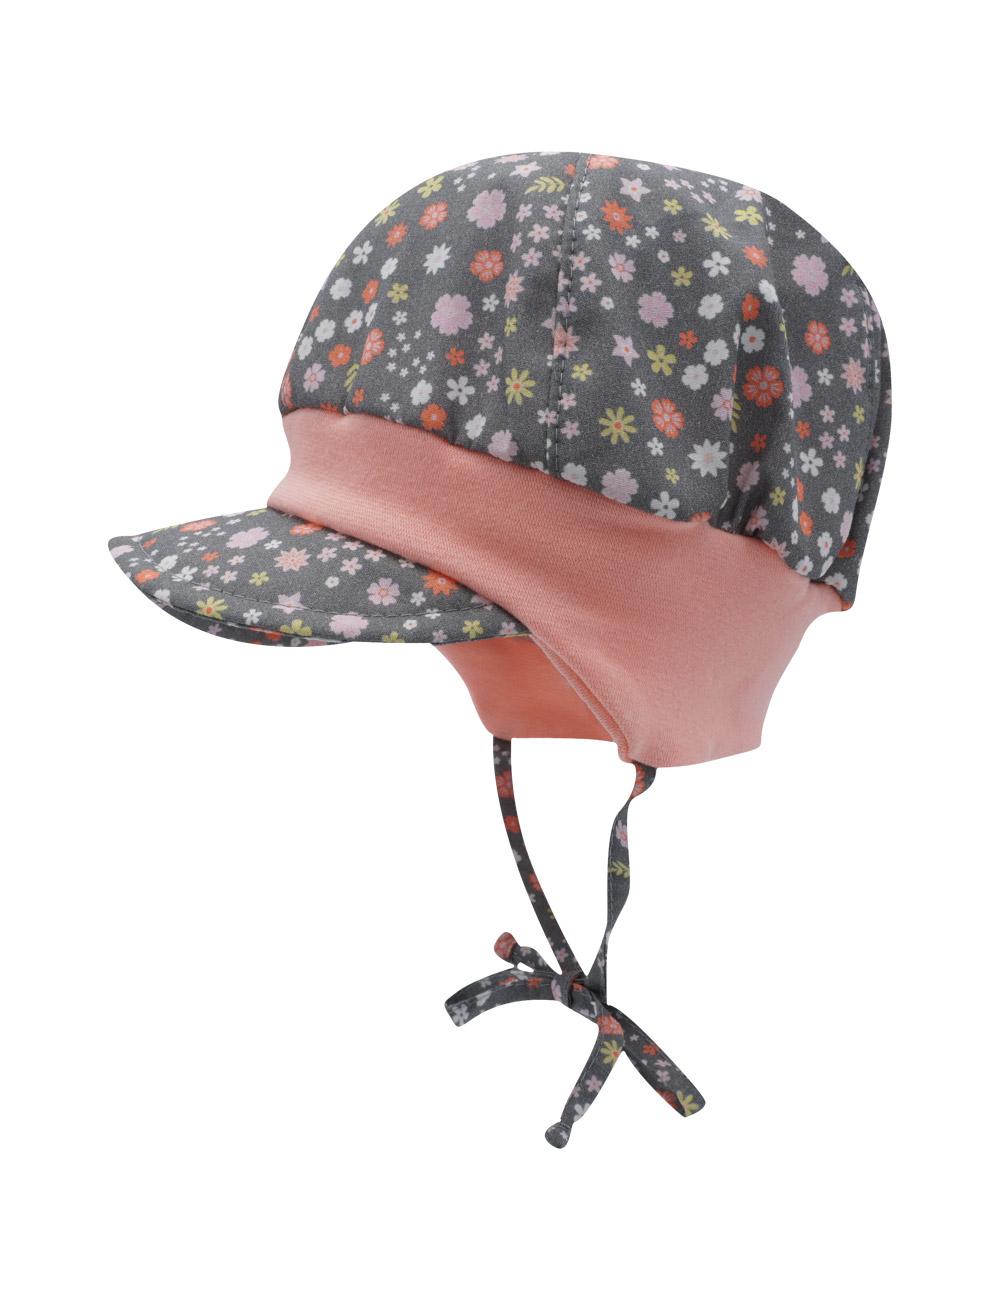 GIRL-Schildmütze 45 Maximo. Farbe: holzkohle-rosa-blümchen, Größe: 45